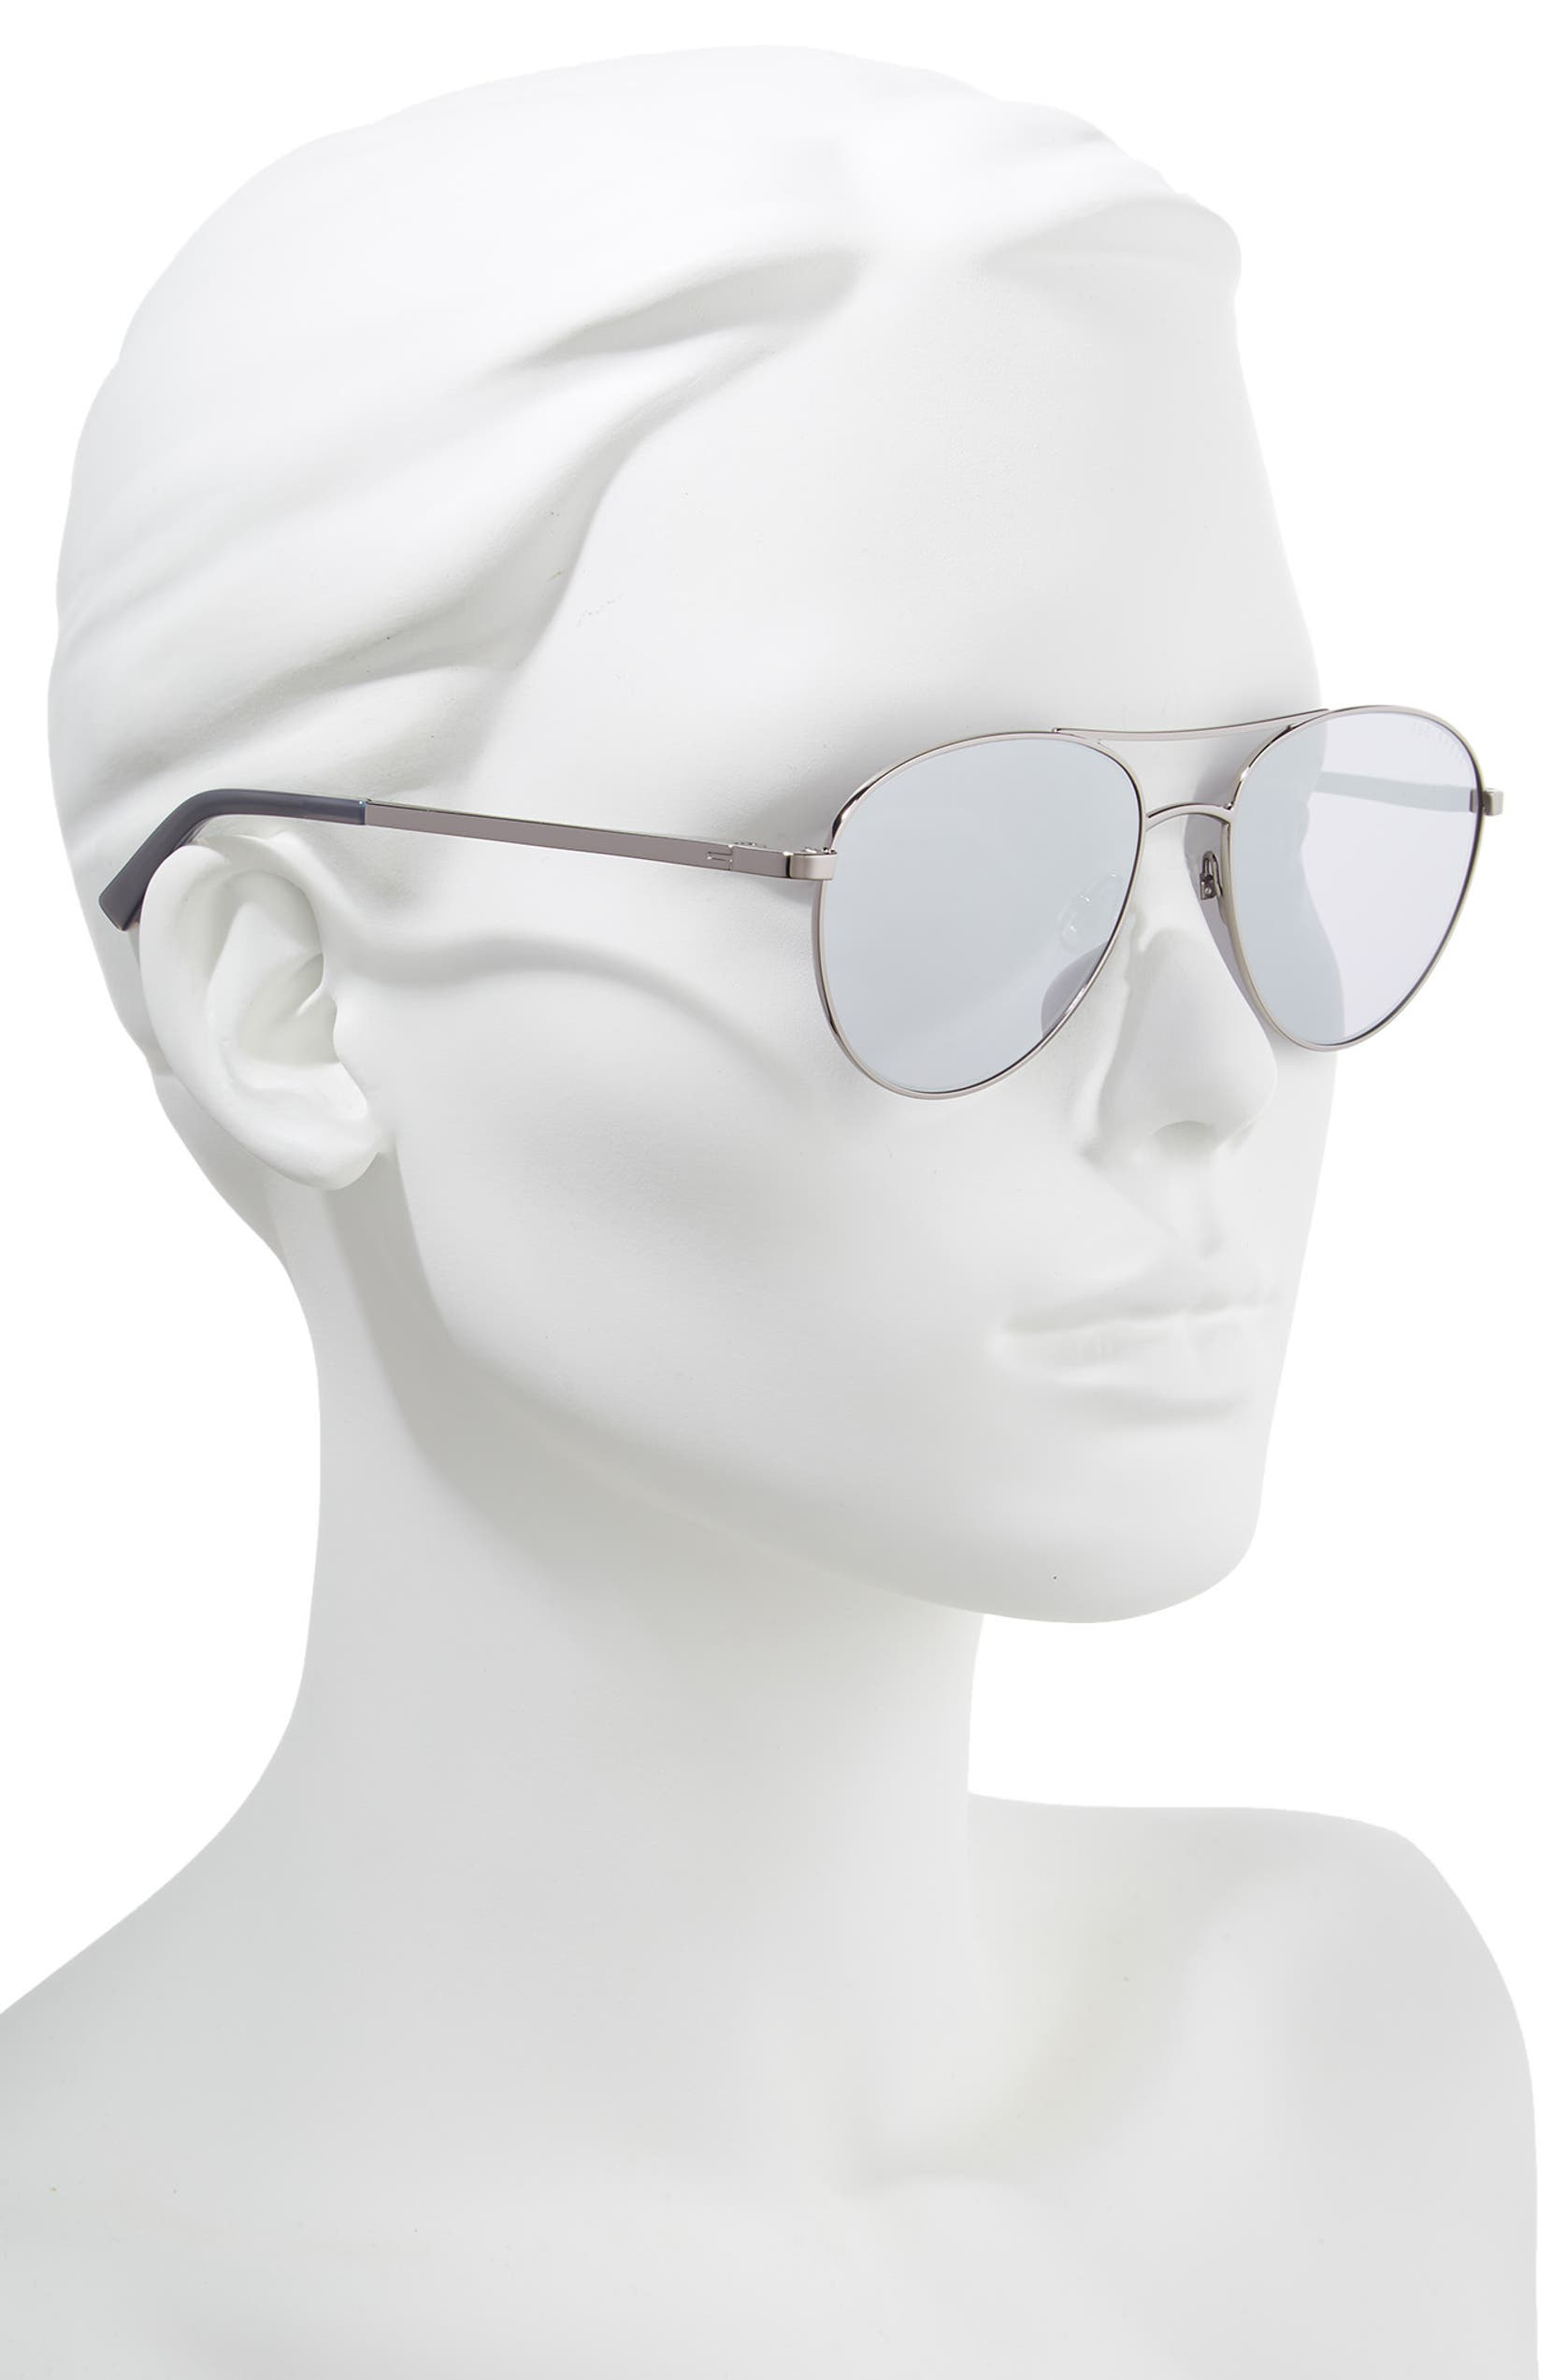 86d4a064acddc Ted Baker London 55mm Aviator Sunglasses